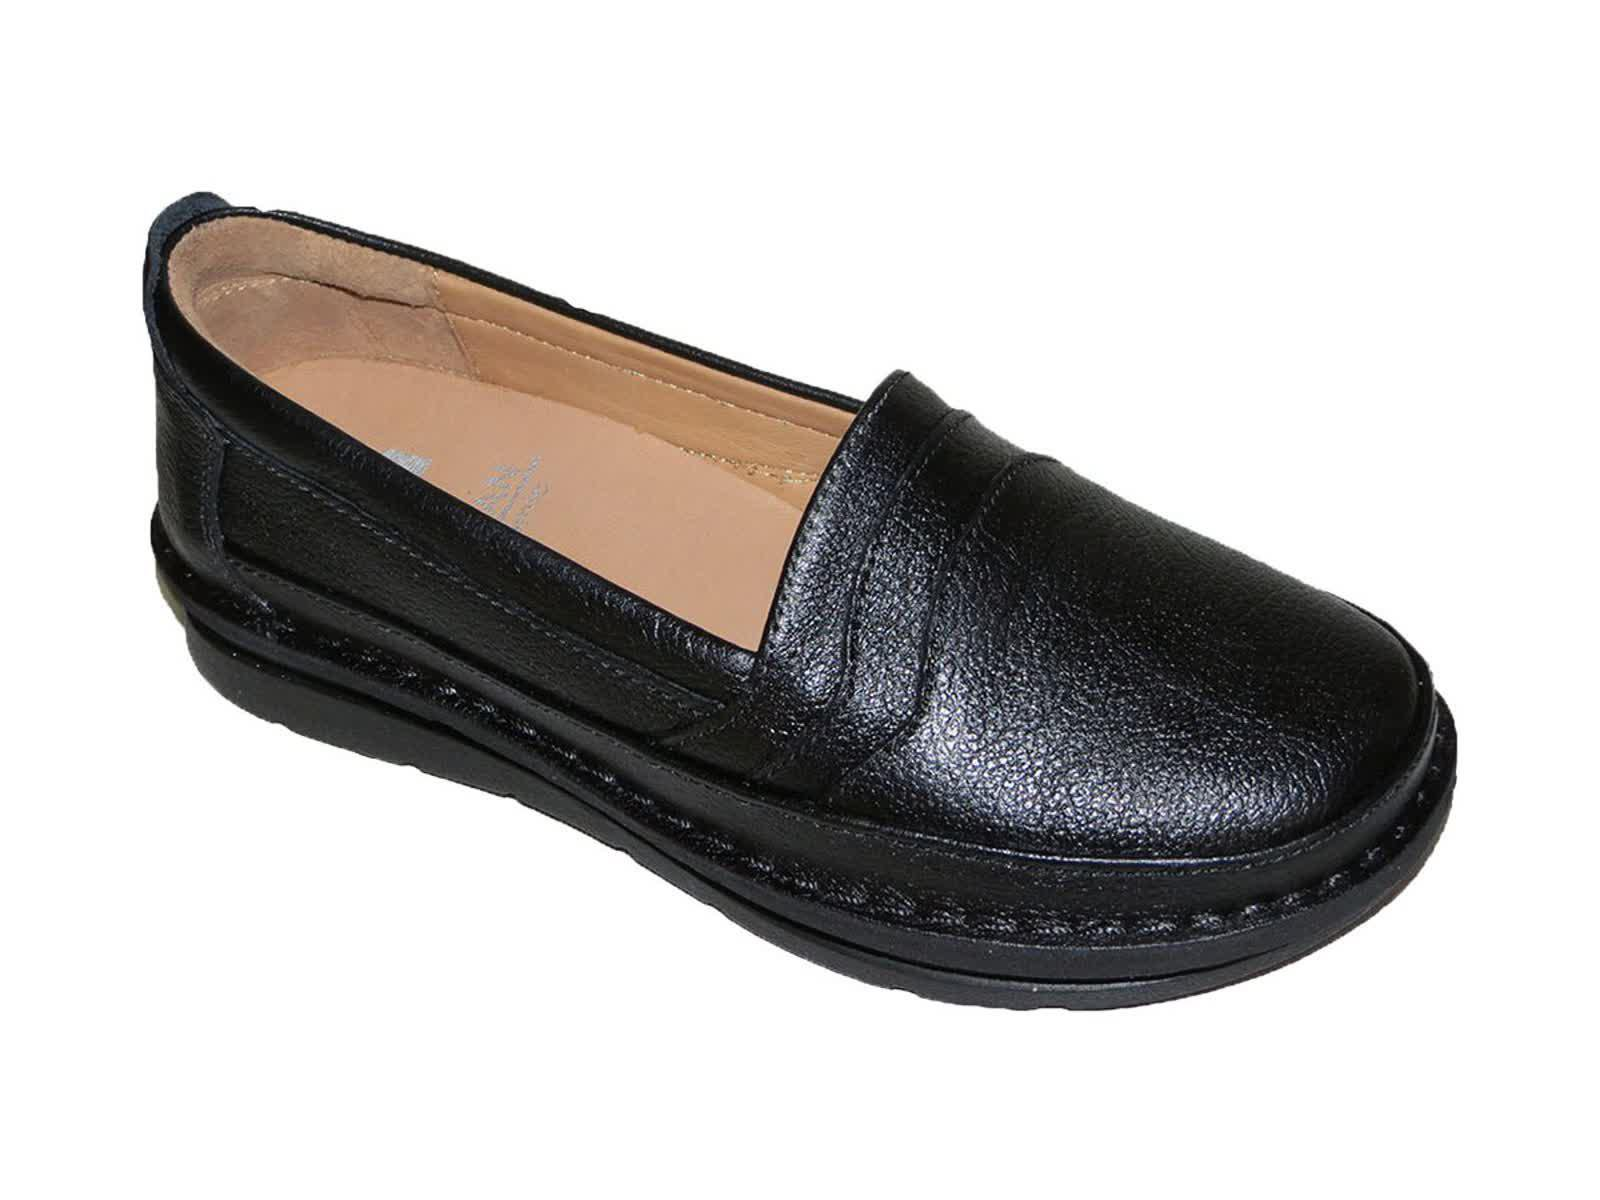 کفش کلارک زنانه مدل آنیل مشکی